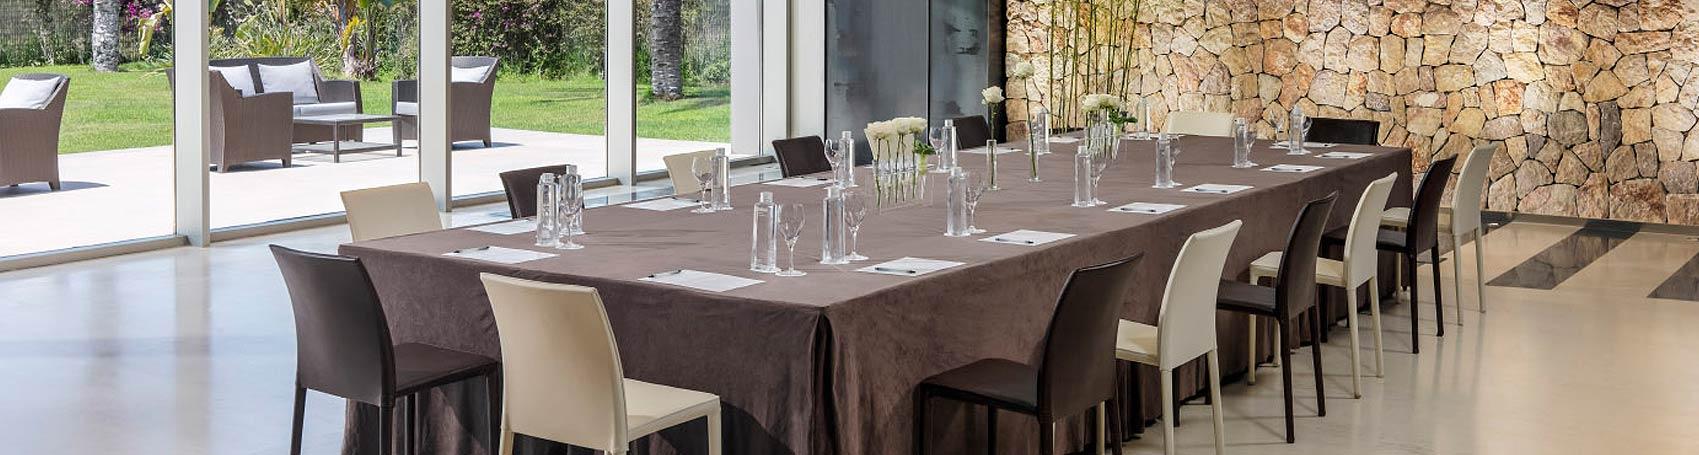 Organización de eventos de empresa, corporativos, bodas y fiestas privadas en Ibiza. Servicios VIP. Consulting Services Ibiza